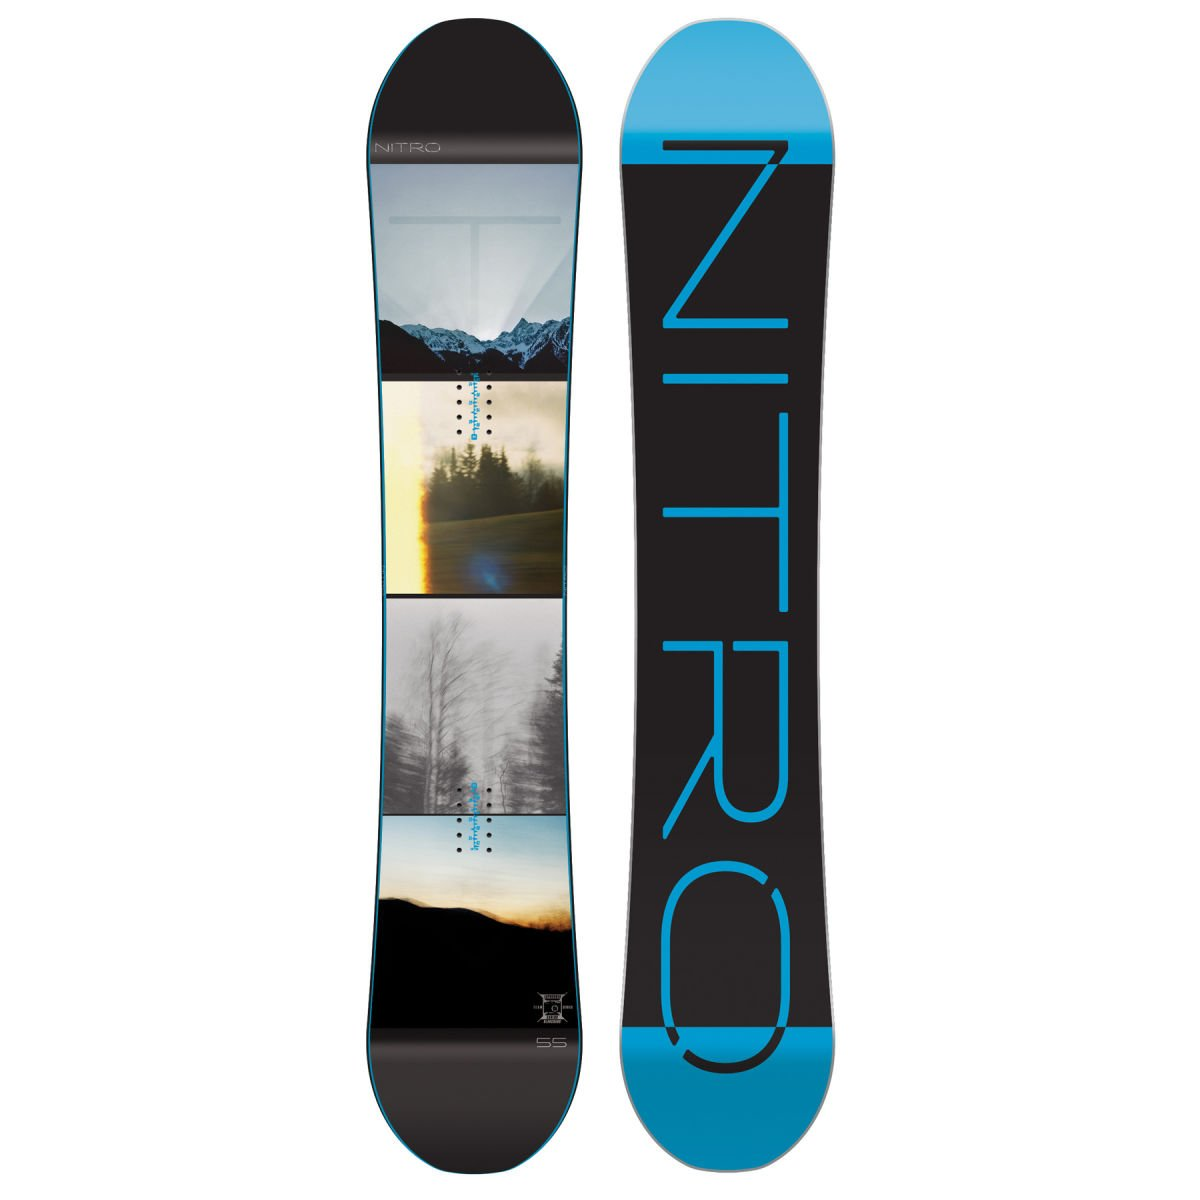 f687f2e590b Nitro Team Exposure Gullwing Snowboard - Men s 162cm